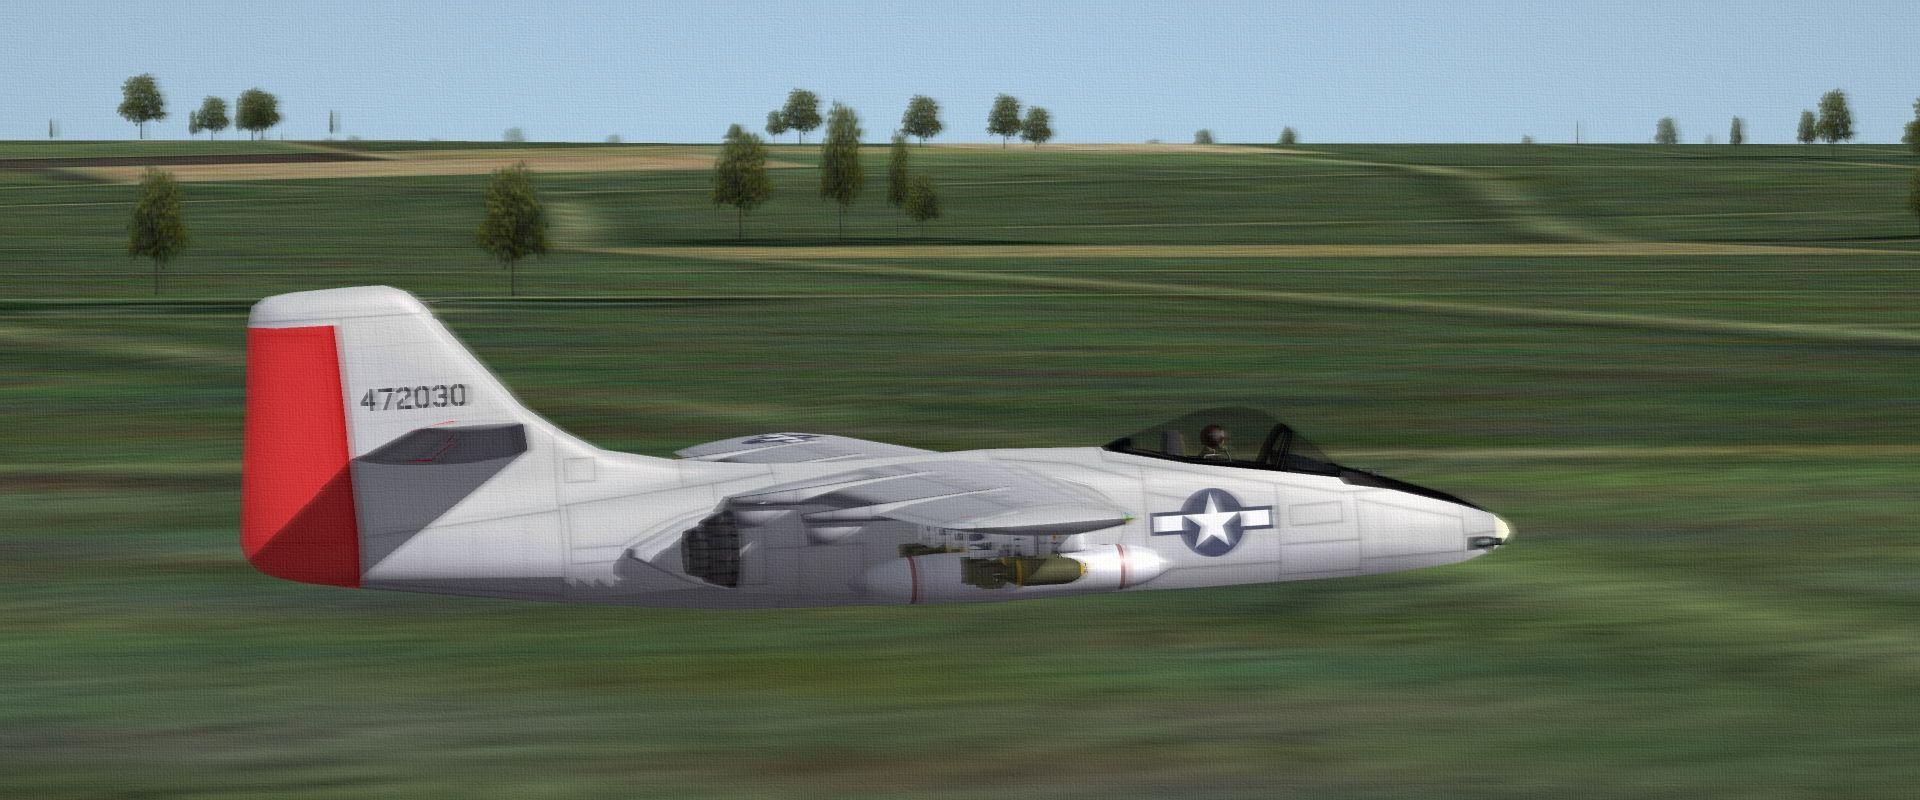 USAACA-28BMAMBA03_zpse0ab444f.jpg